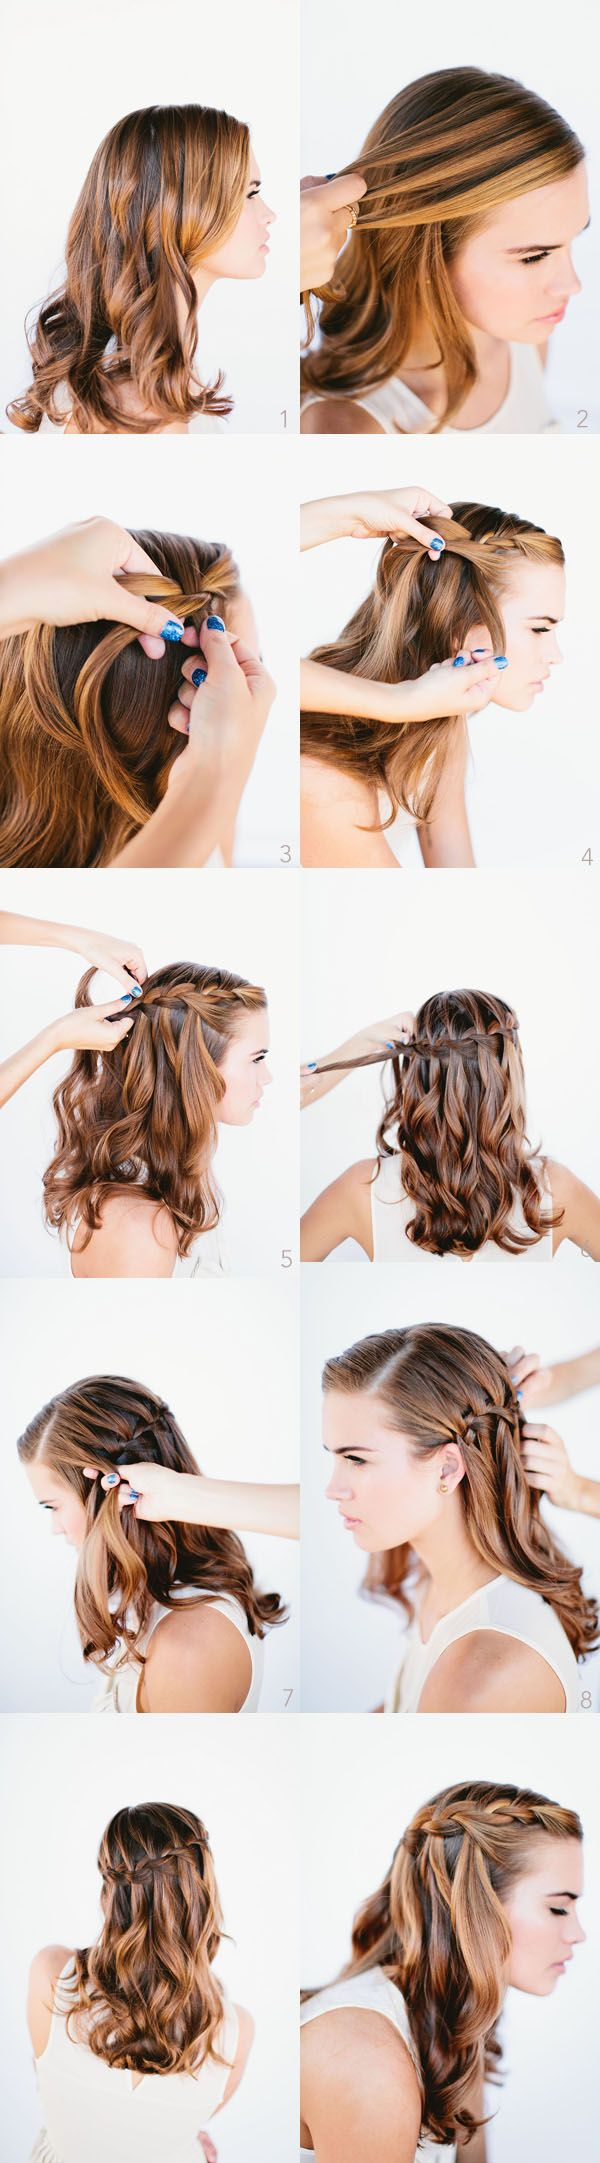 Fabulous 1000 Ideas About Junior Bridesmaid Hairstyles On Pinterest Short Hairstyles For Black Women Fulllsitofus